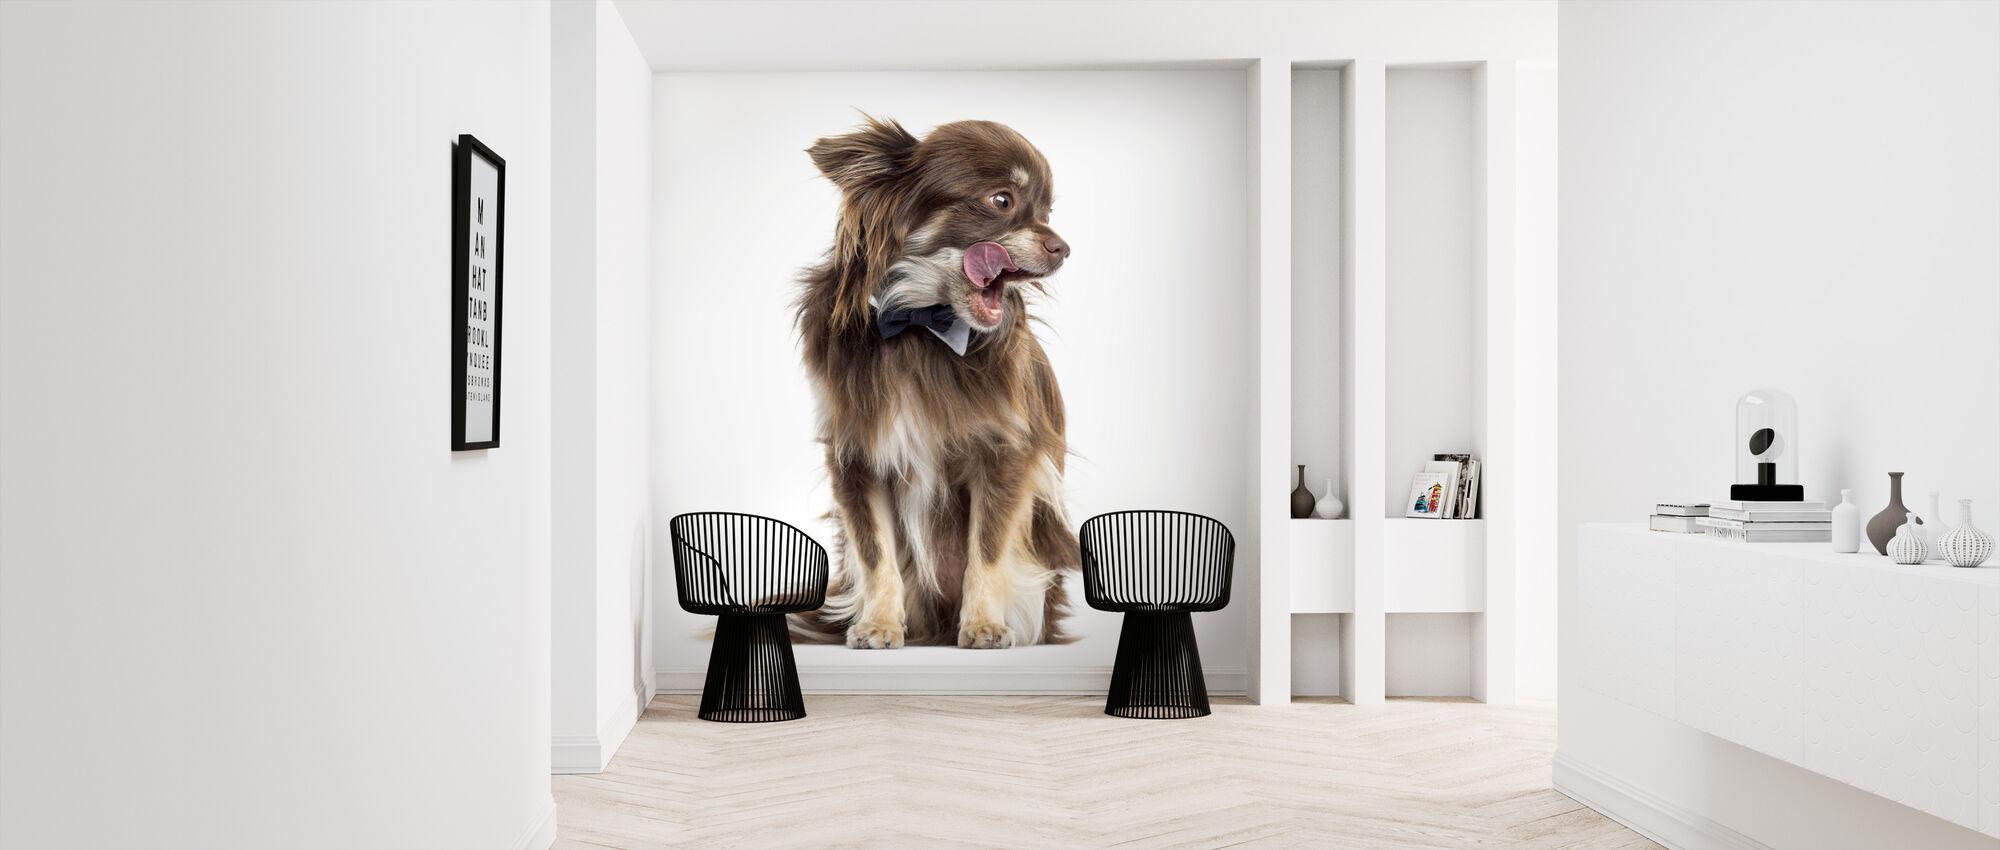 Chihuahua - Wallpaper - Hallway